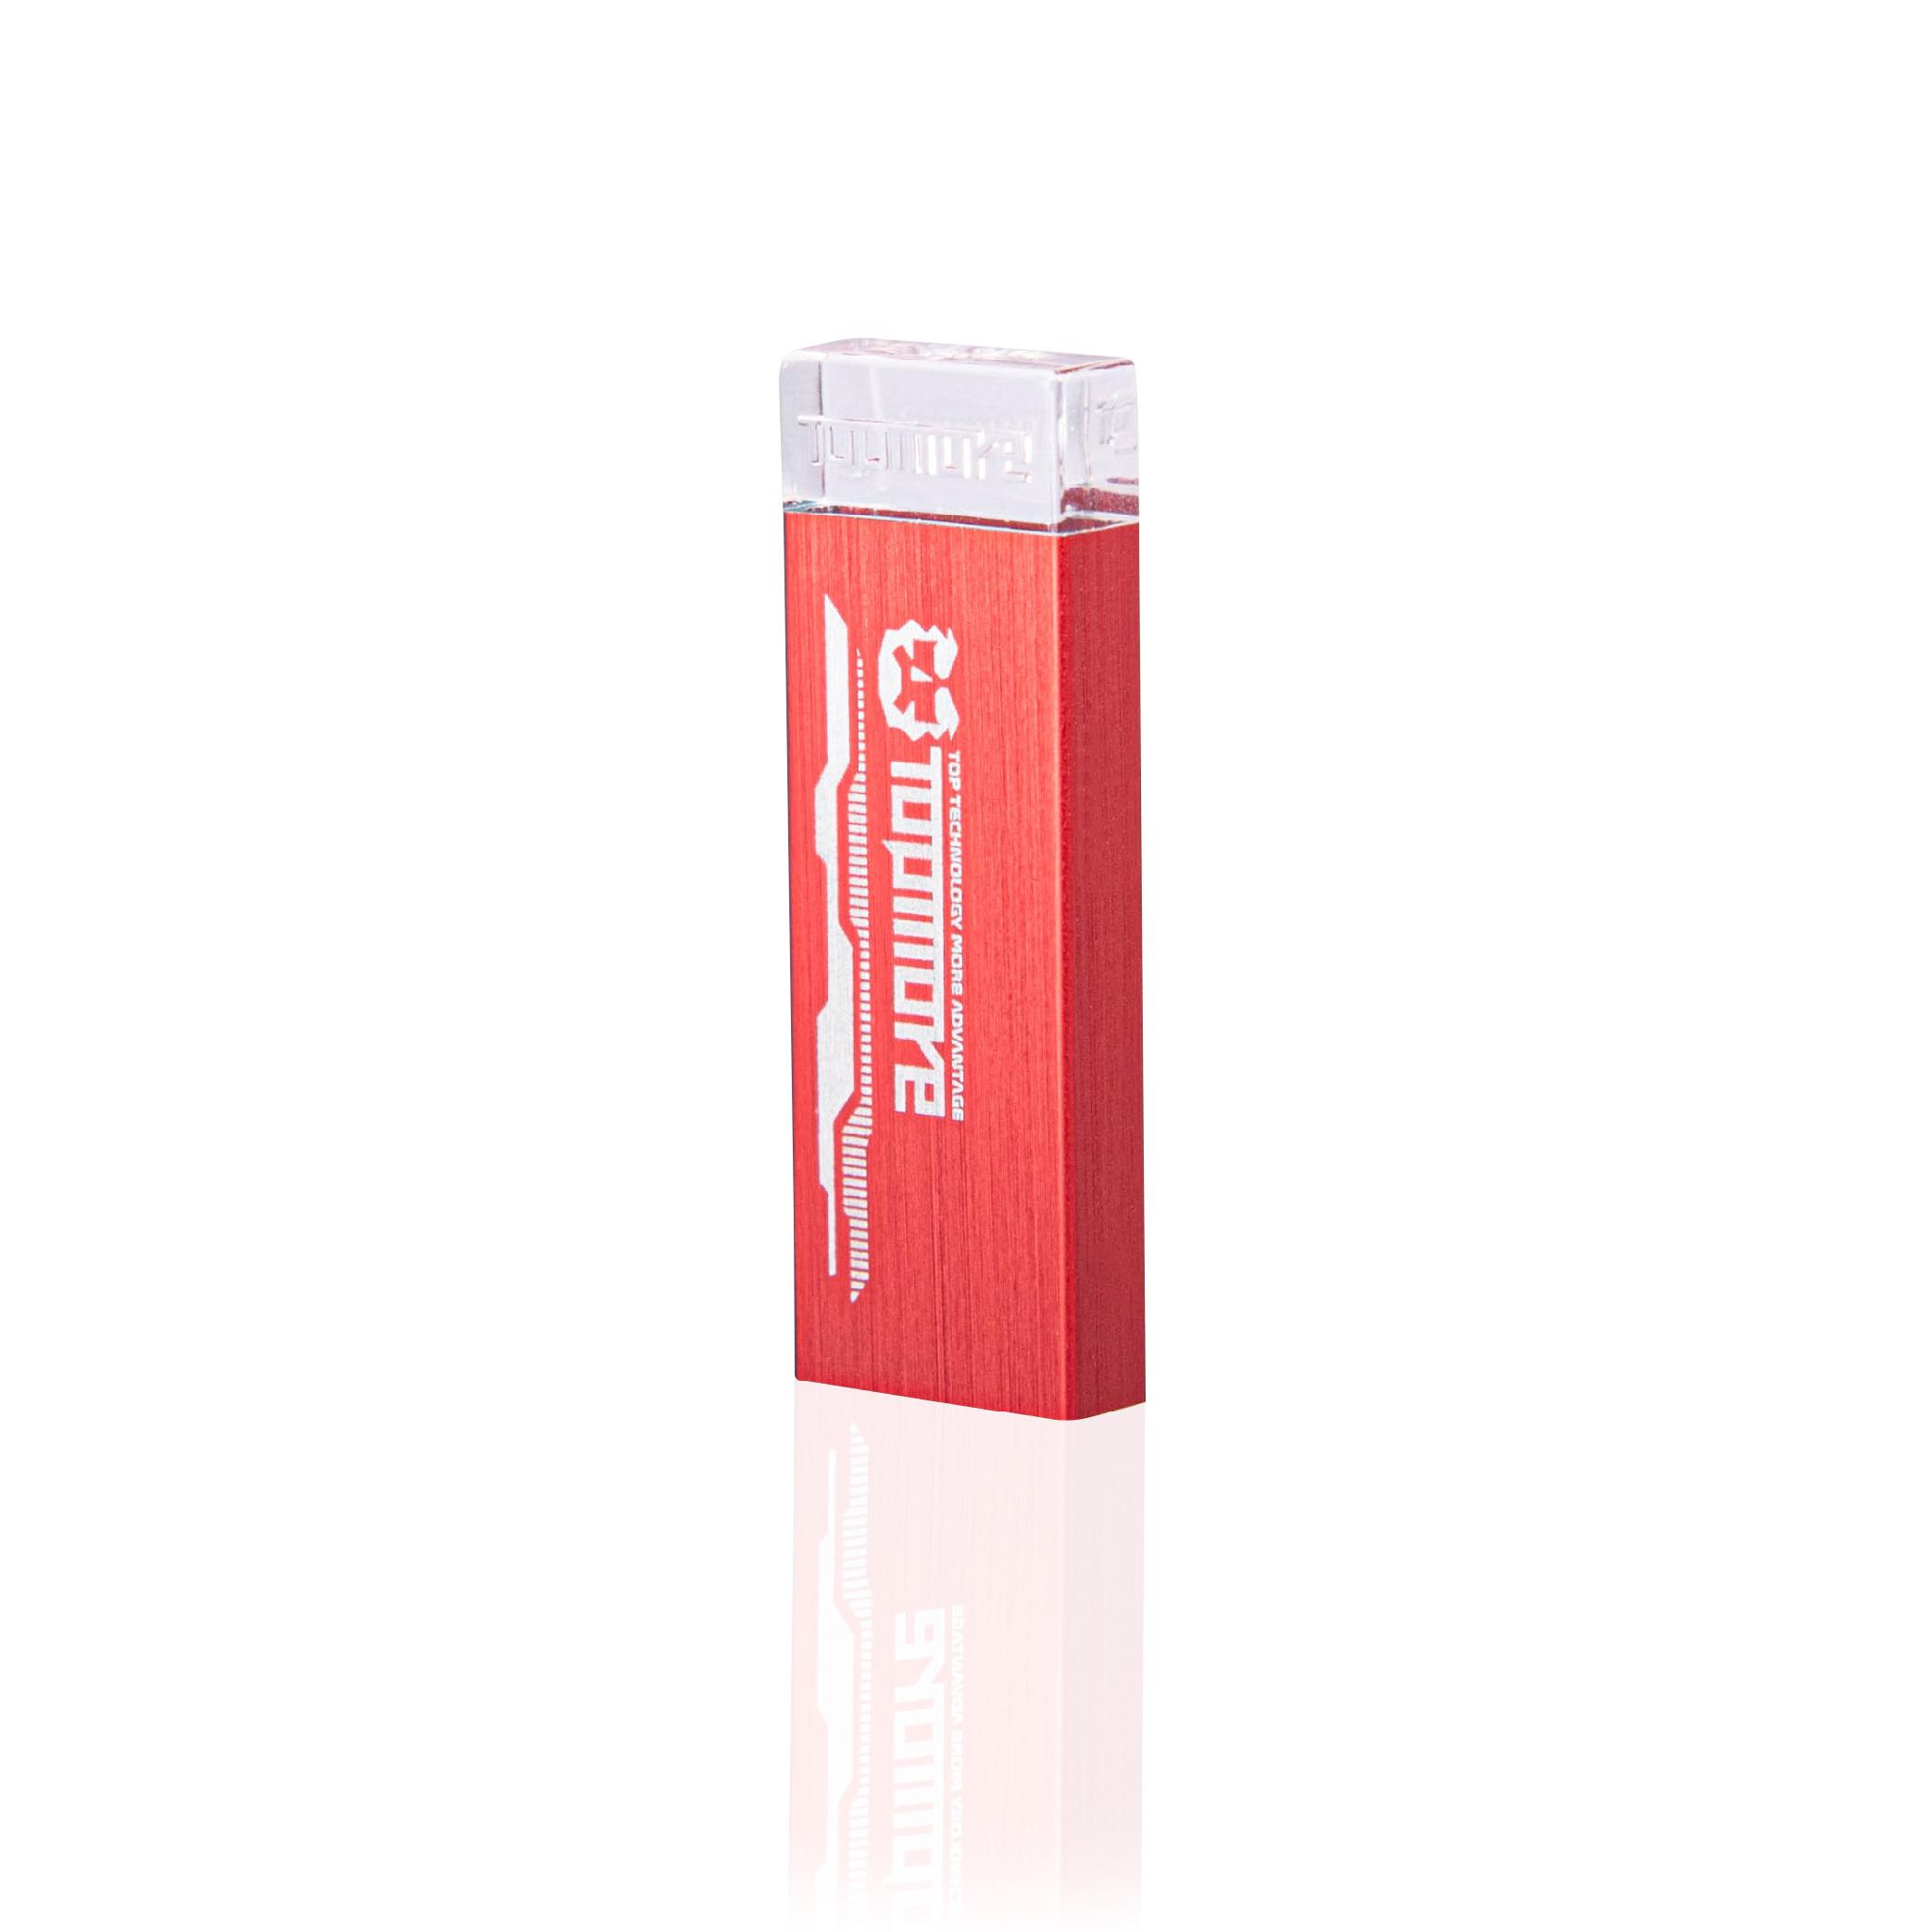 Topmore 達墨系列AI發光隨身碟 USB3.0 128GB-紅色